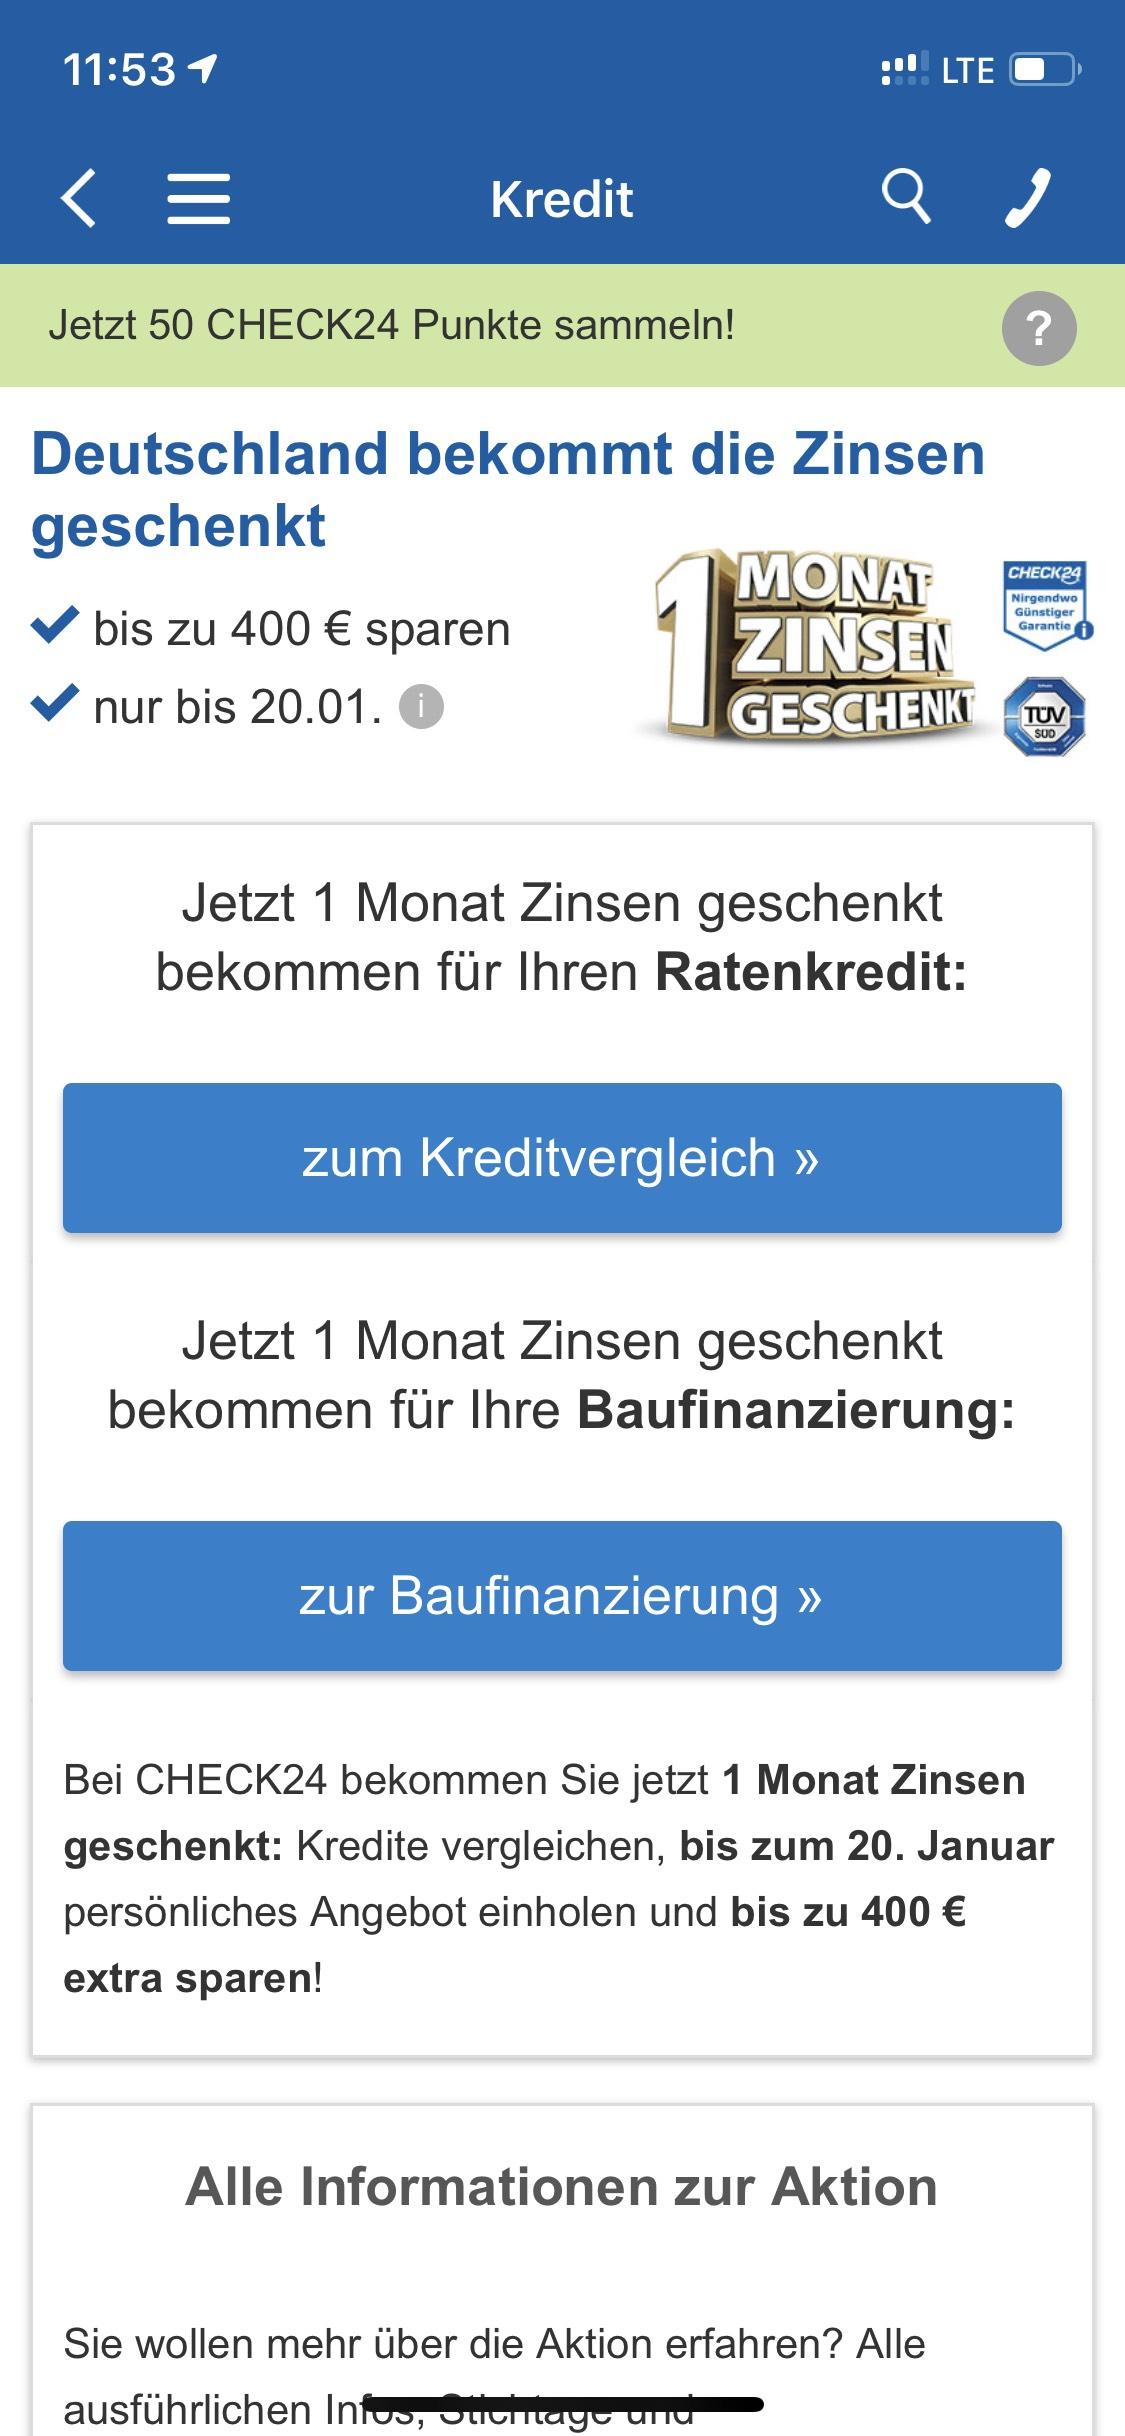 Check24 - Bis zu 400€ Monatsrate bei Kredit geschenkt